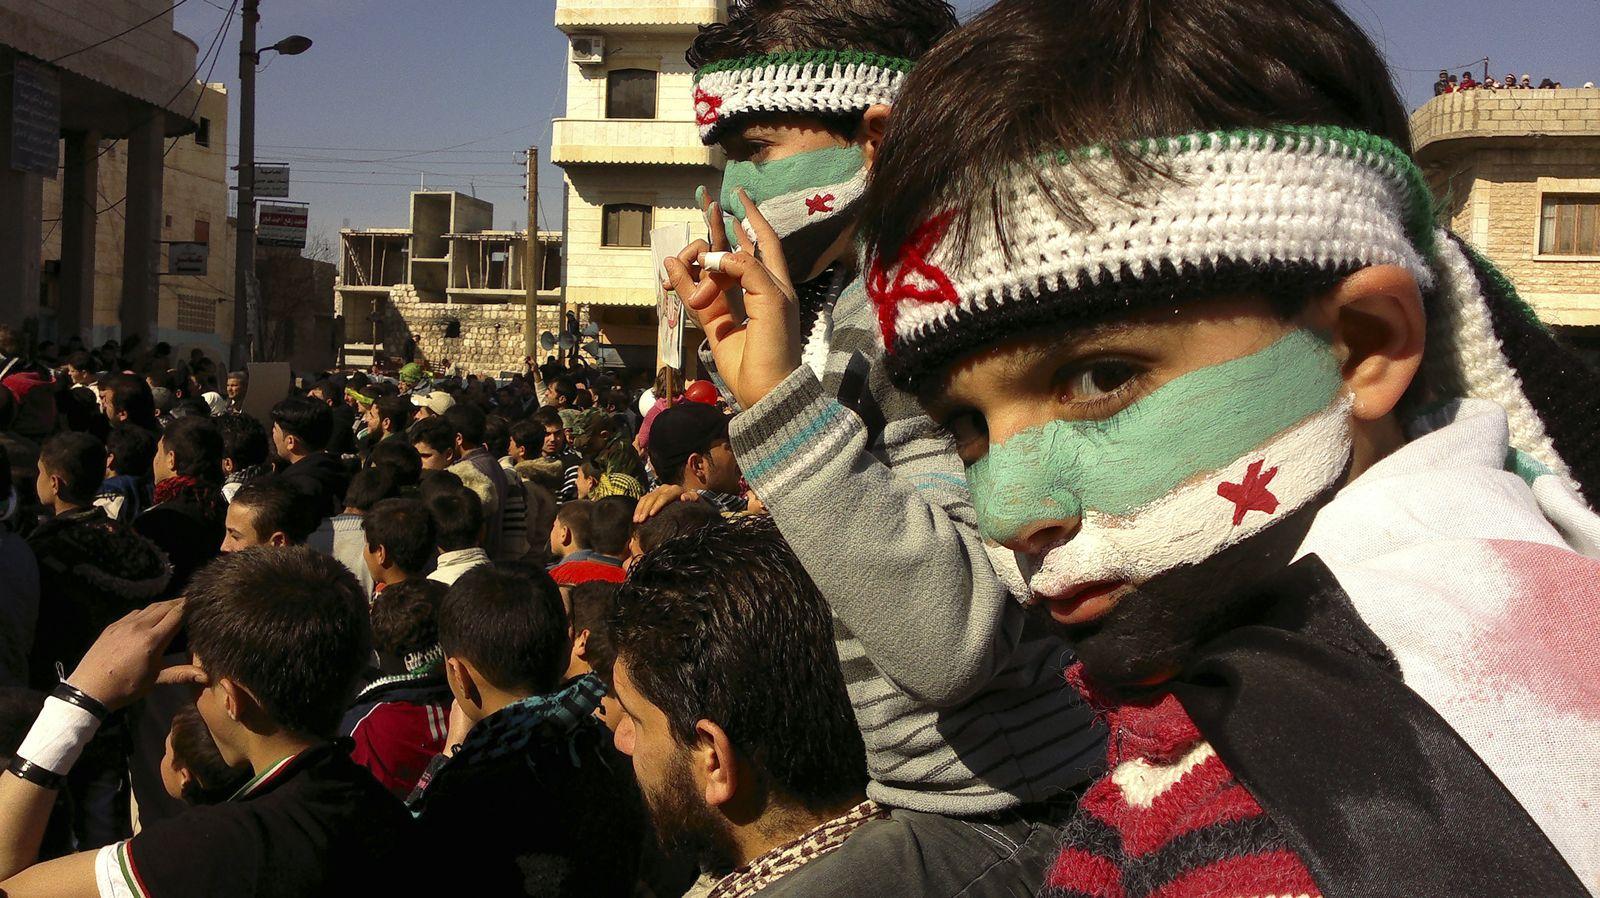 XXL Syrien/ Idlib